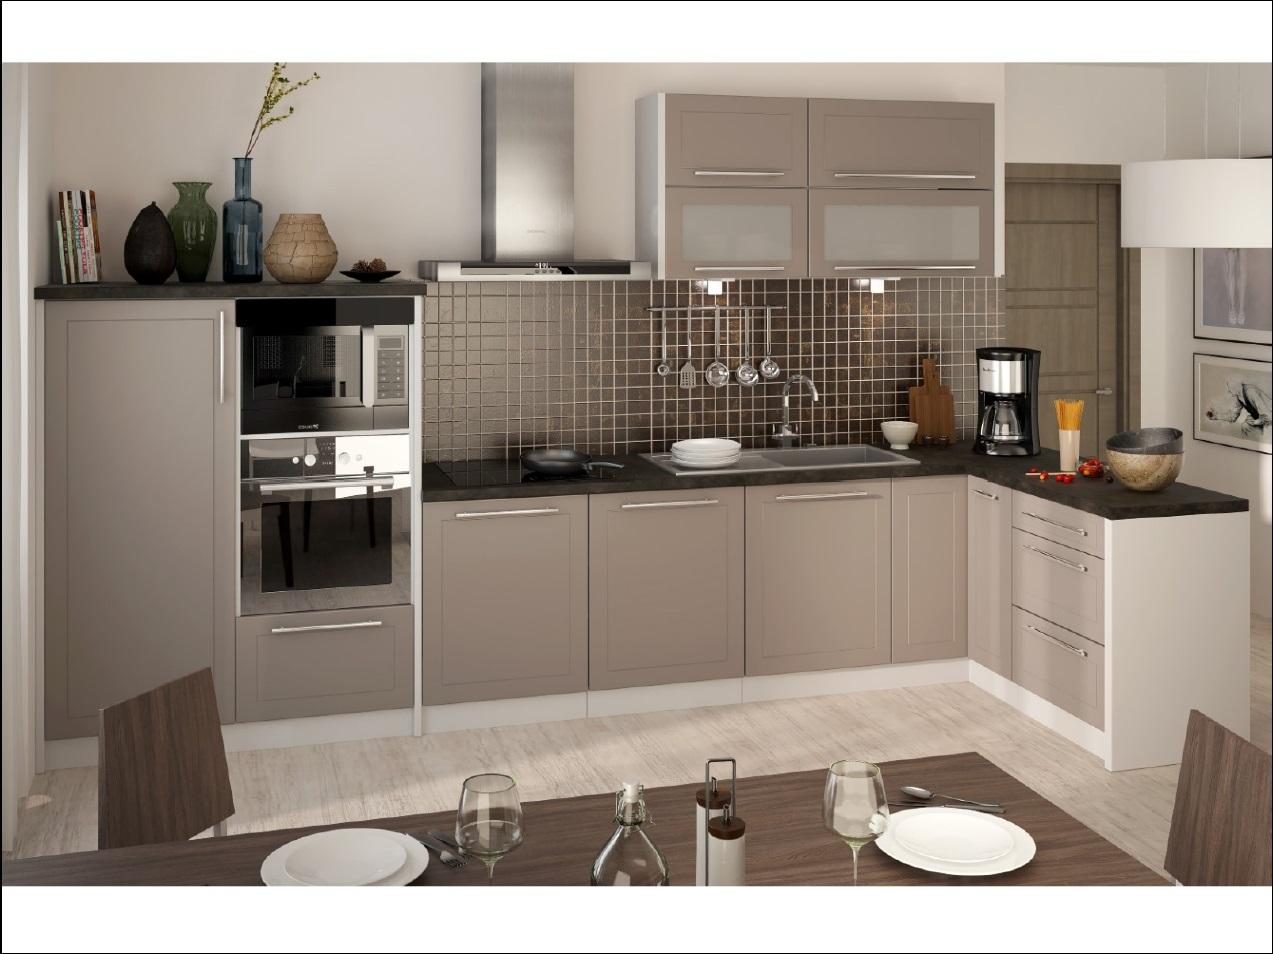 Extom Rohová kuchyně QUANTUM, vzorová sestava, beige mat/grey